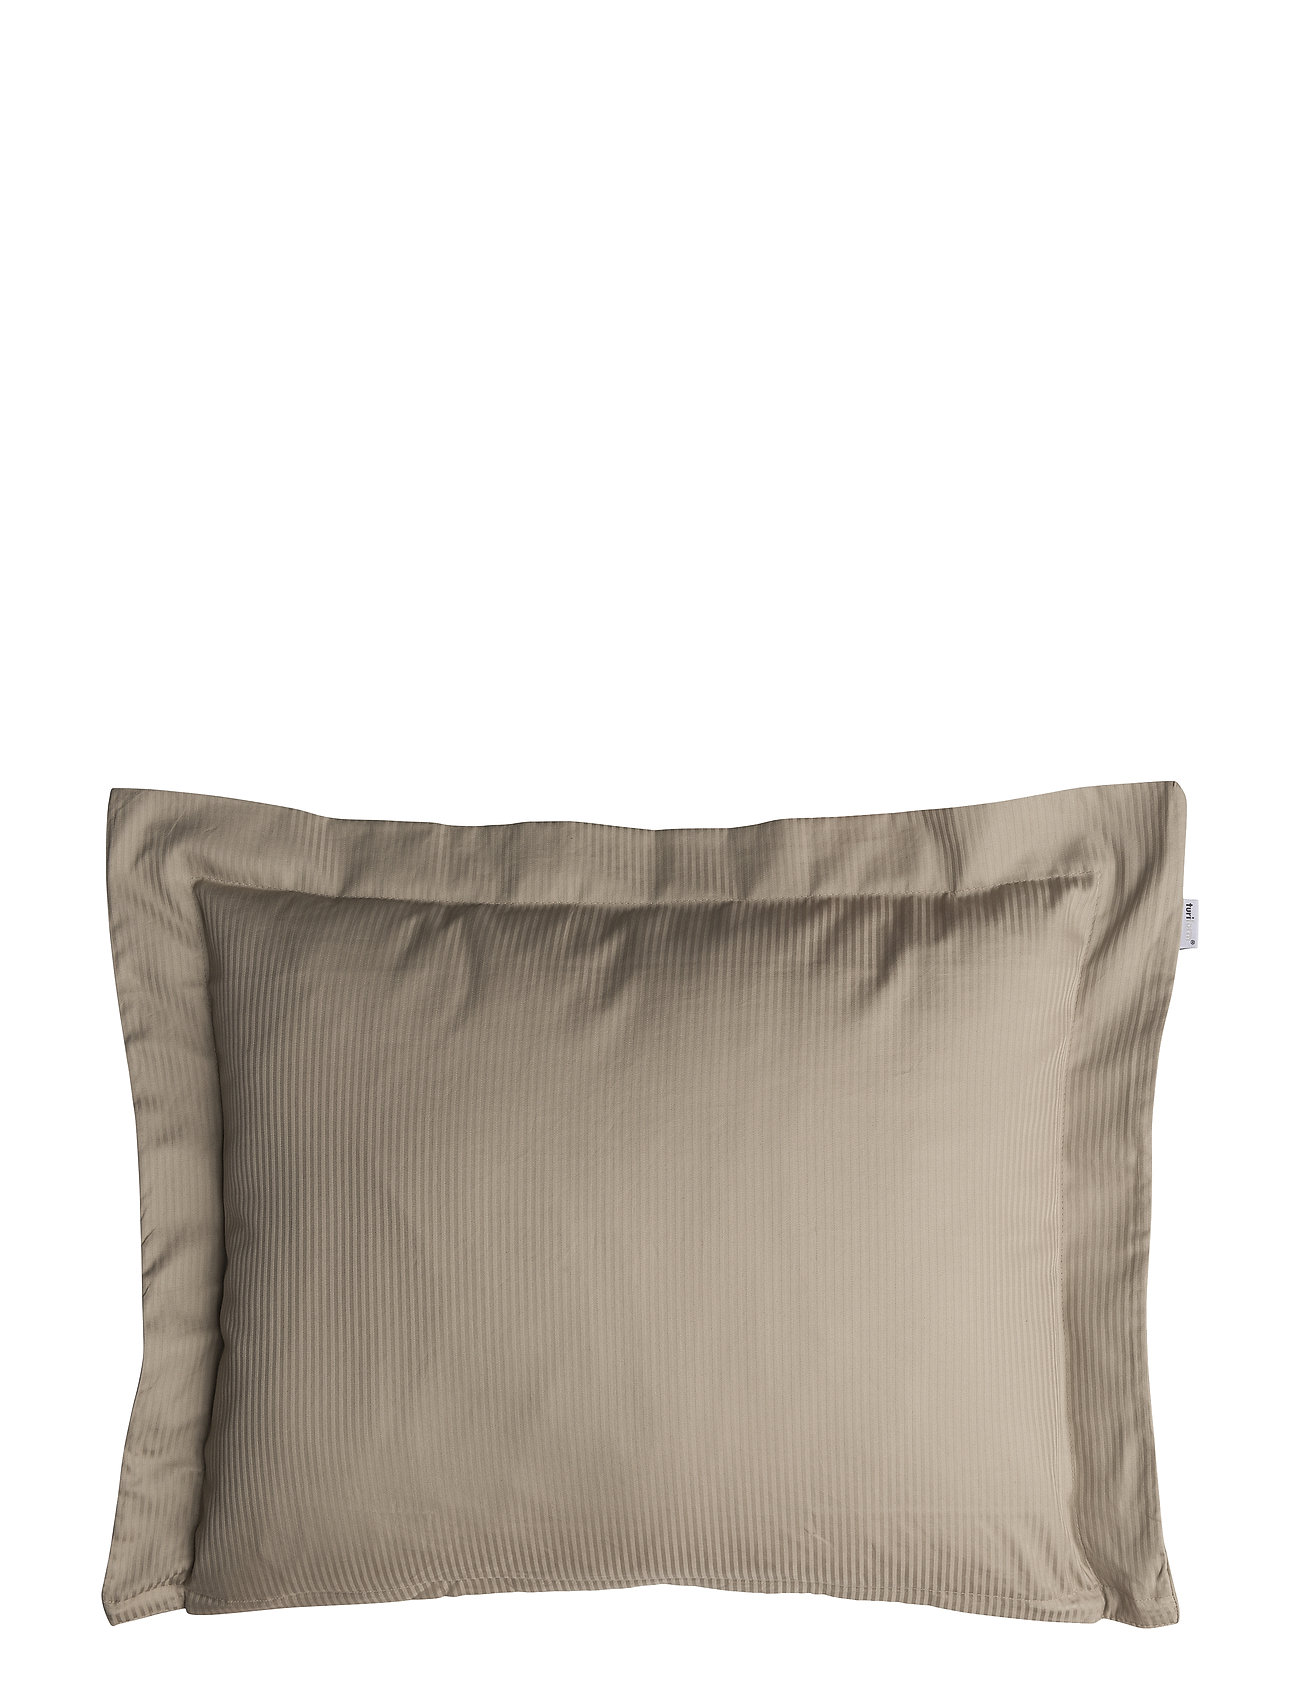 Turiform Turistripe Pillowcase - BEIGE